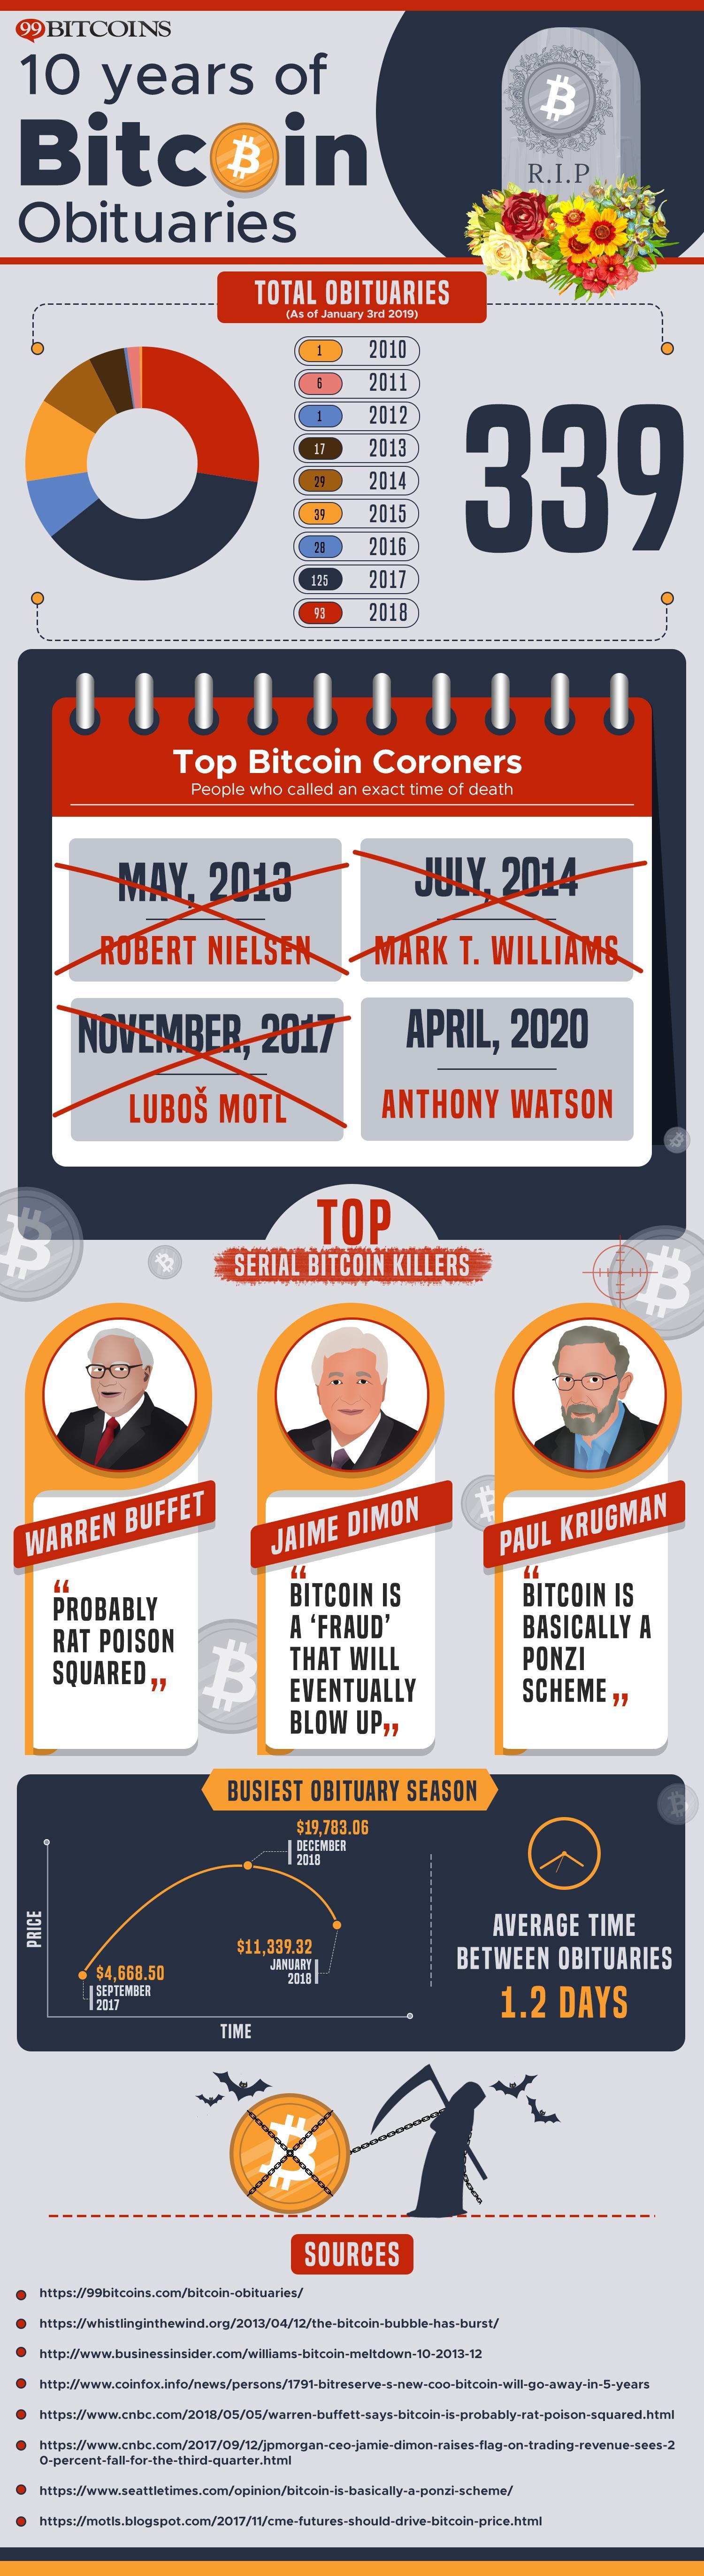 10 Years of Bitcoin Obituaries